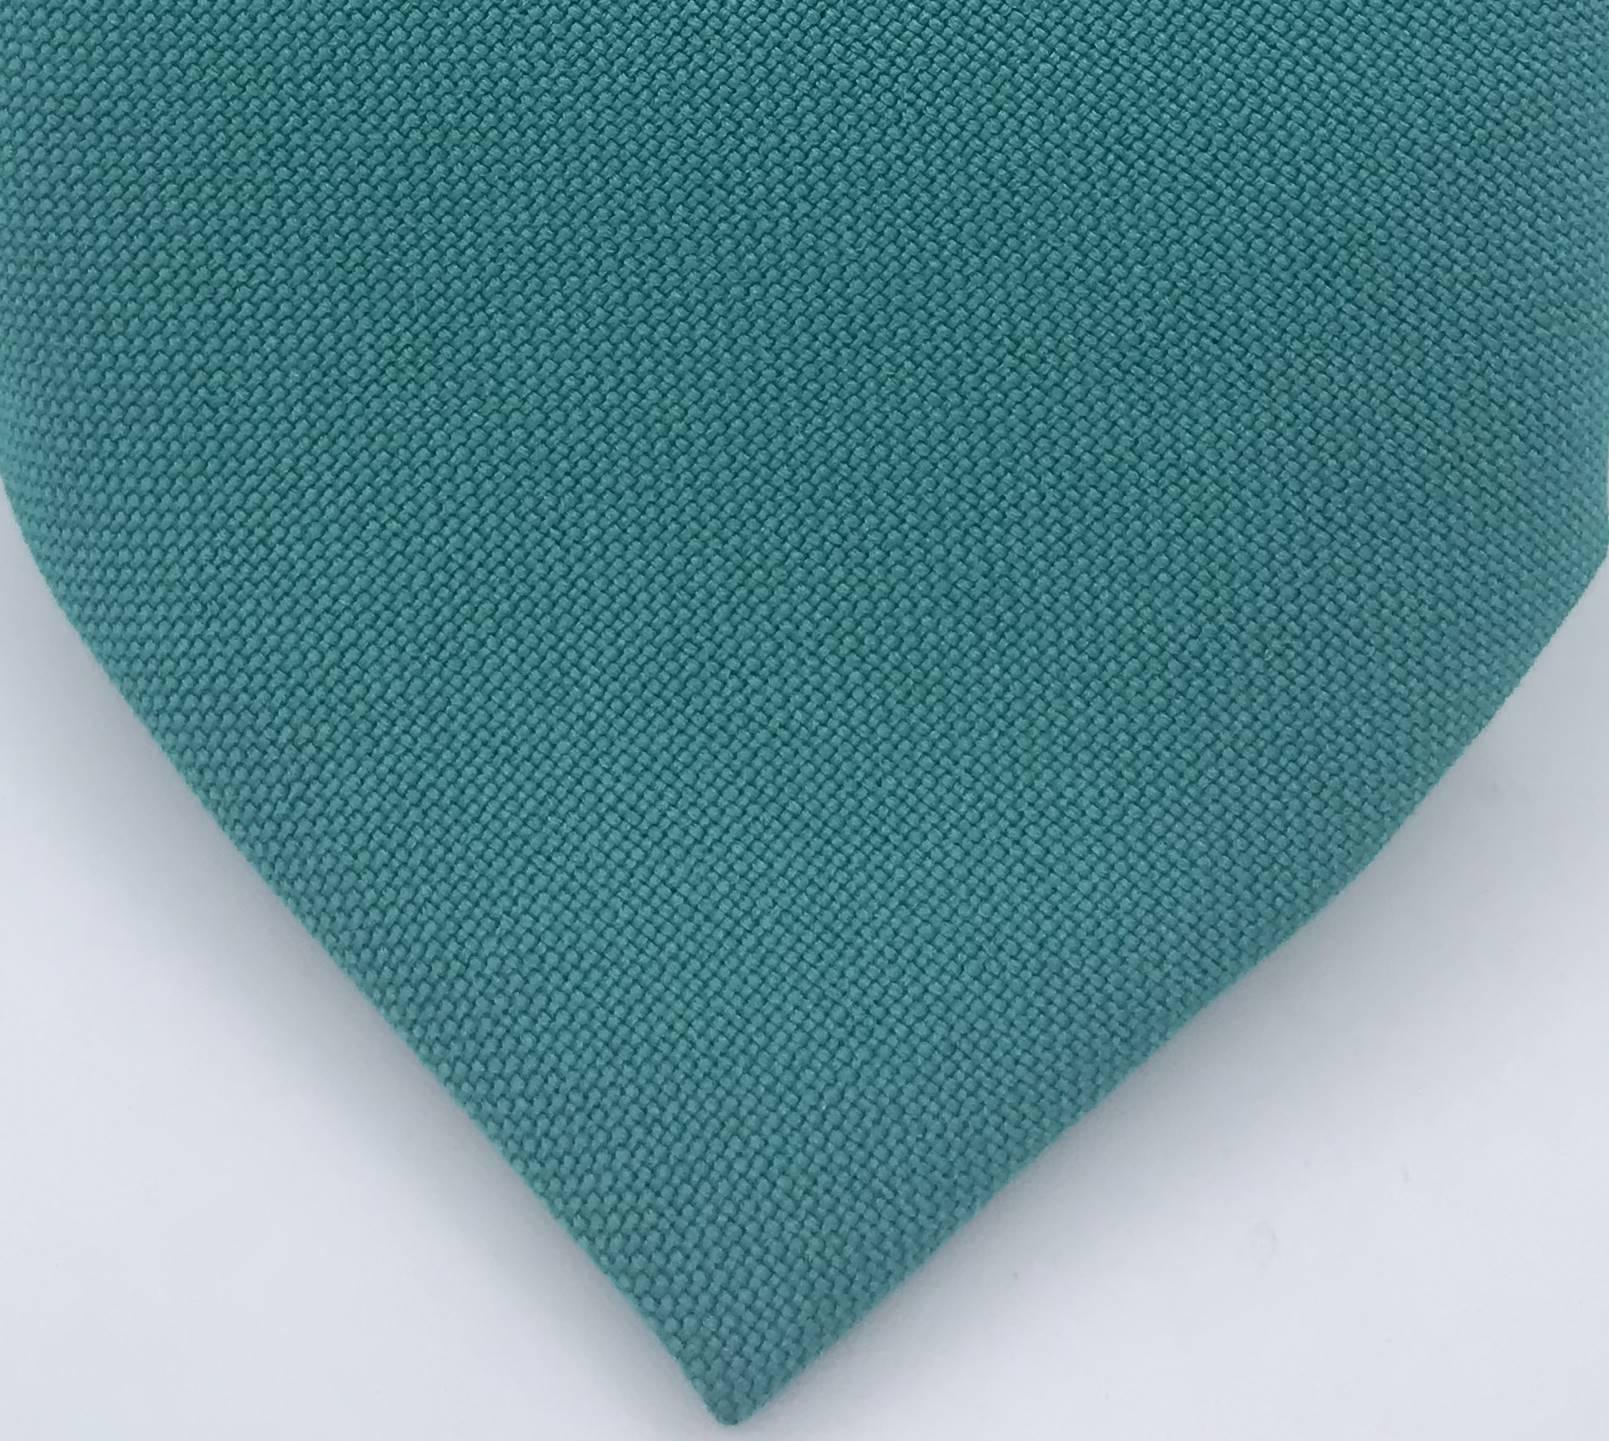 Gravata Semi- Slim Verde Esmeralda Lisa Fosca